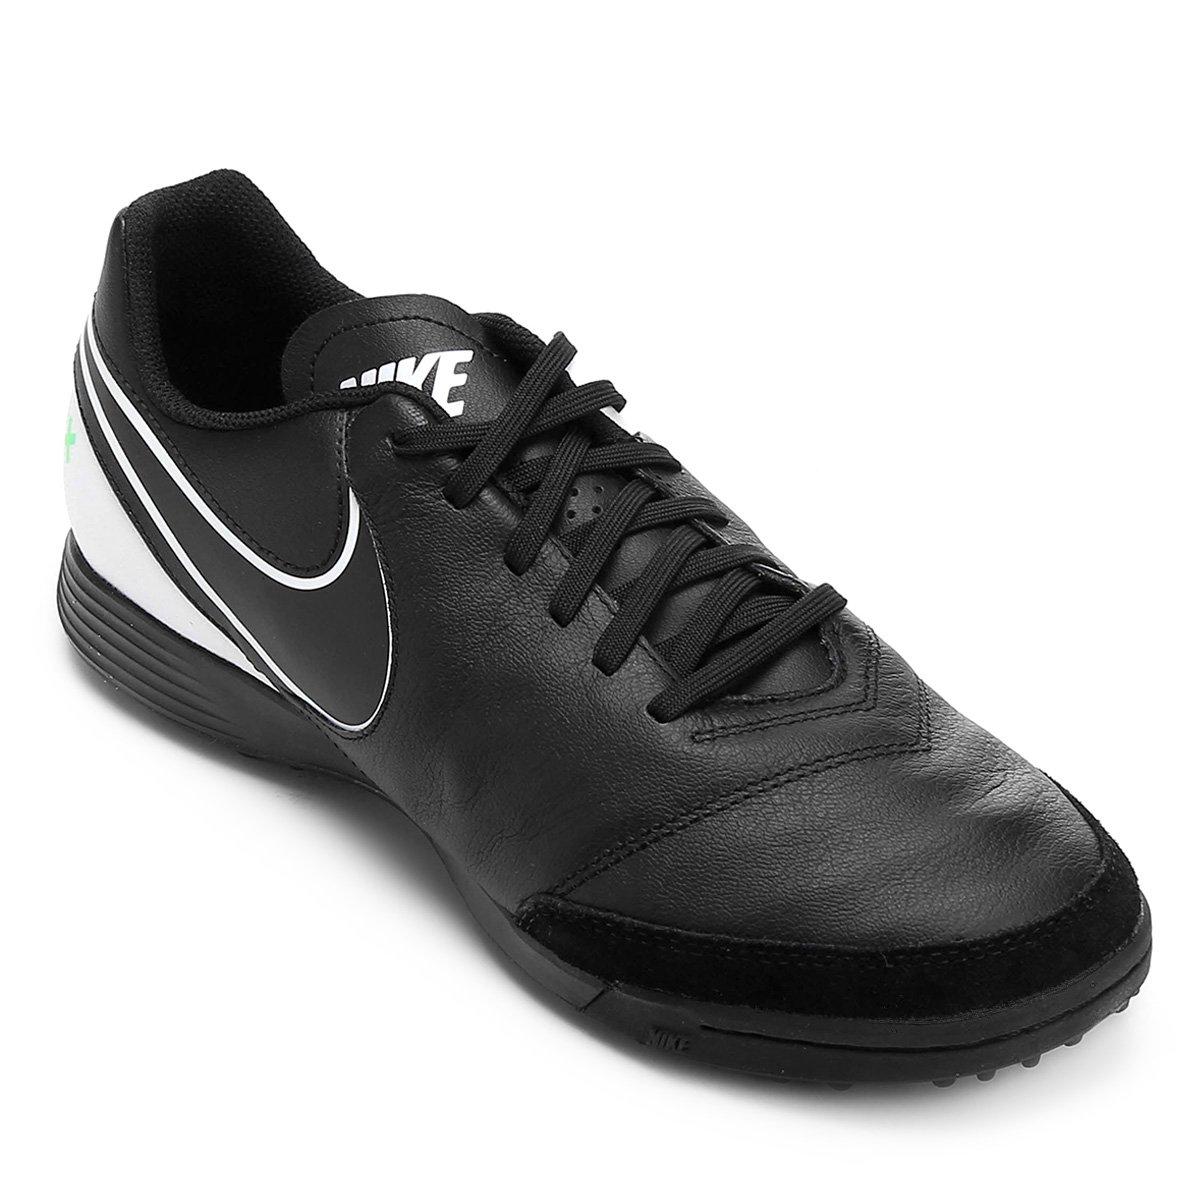 92bca87557 Chuteira Society Nike Tiempo Genio 2 Leather TF - Preto e verde ...